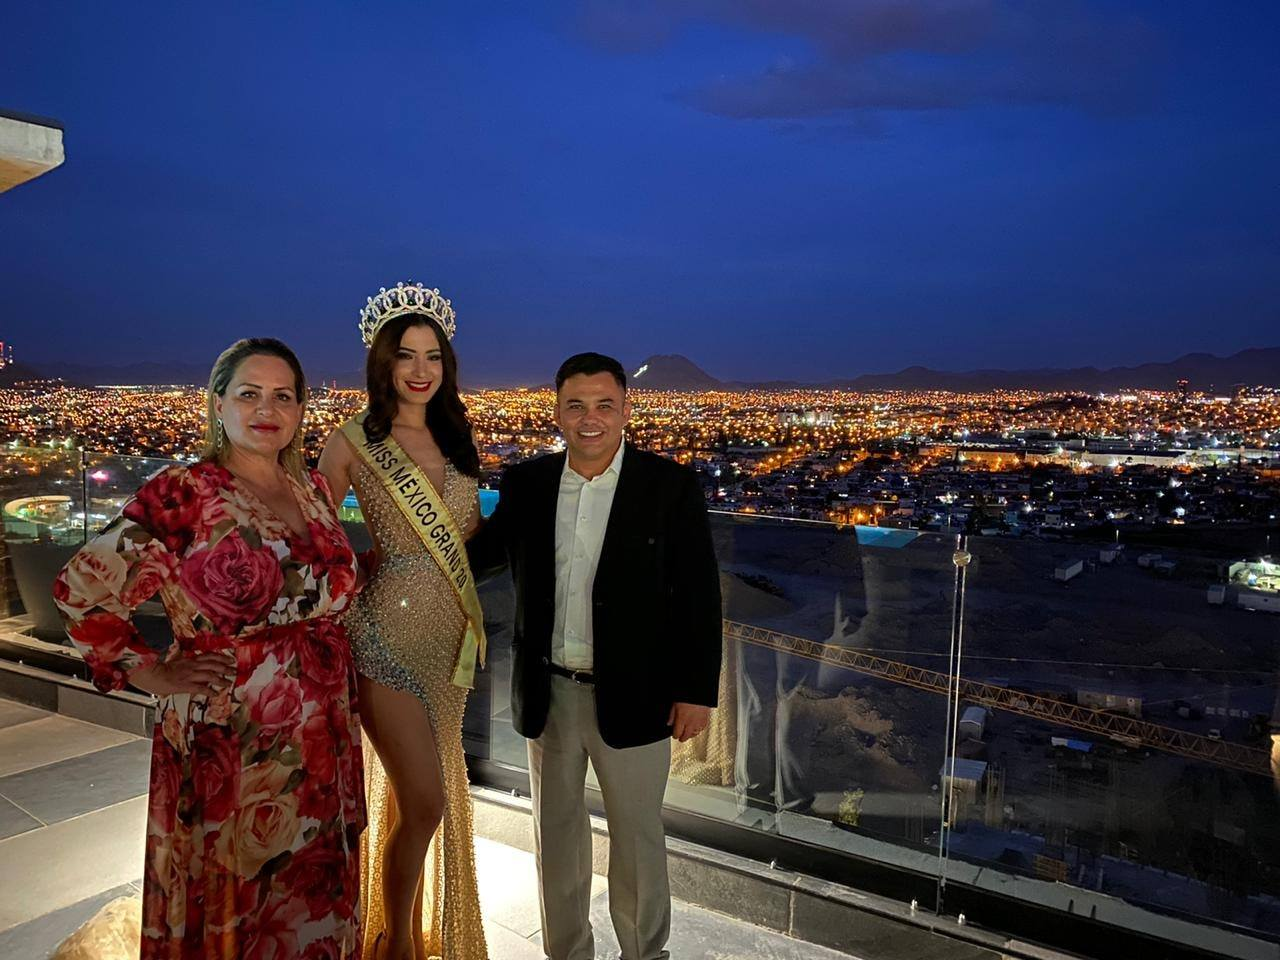 angela leon yuriar, miss grand mexico 2020. - Página 6 11732210